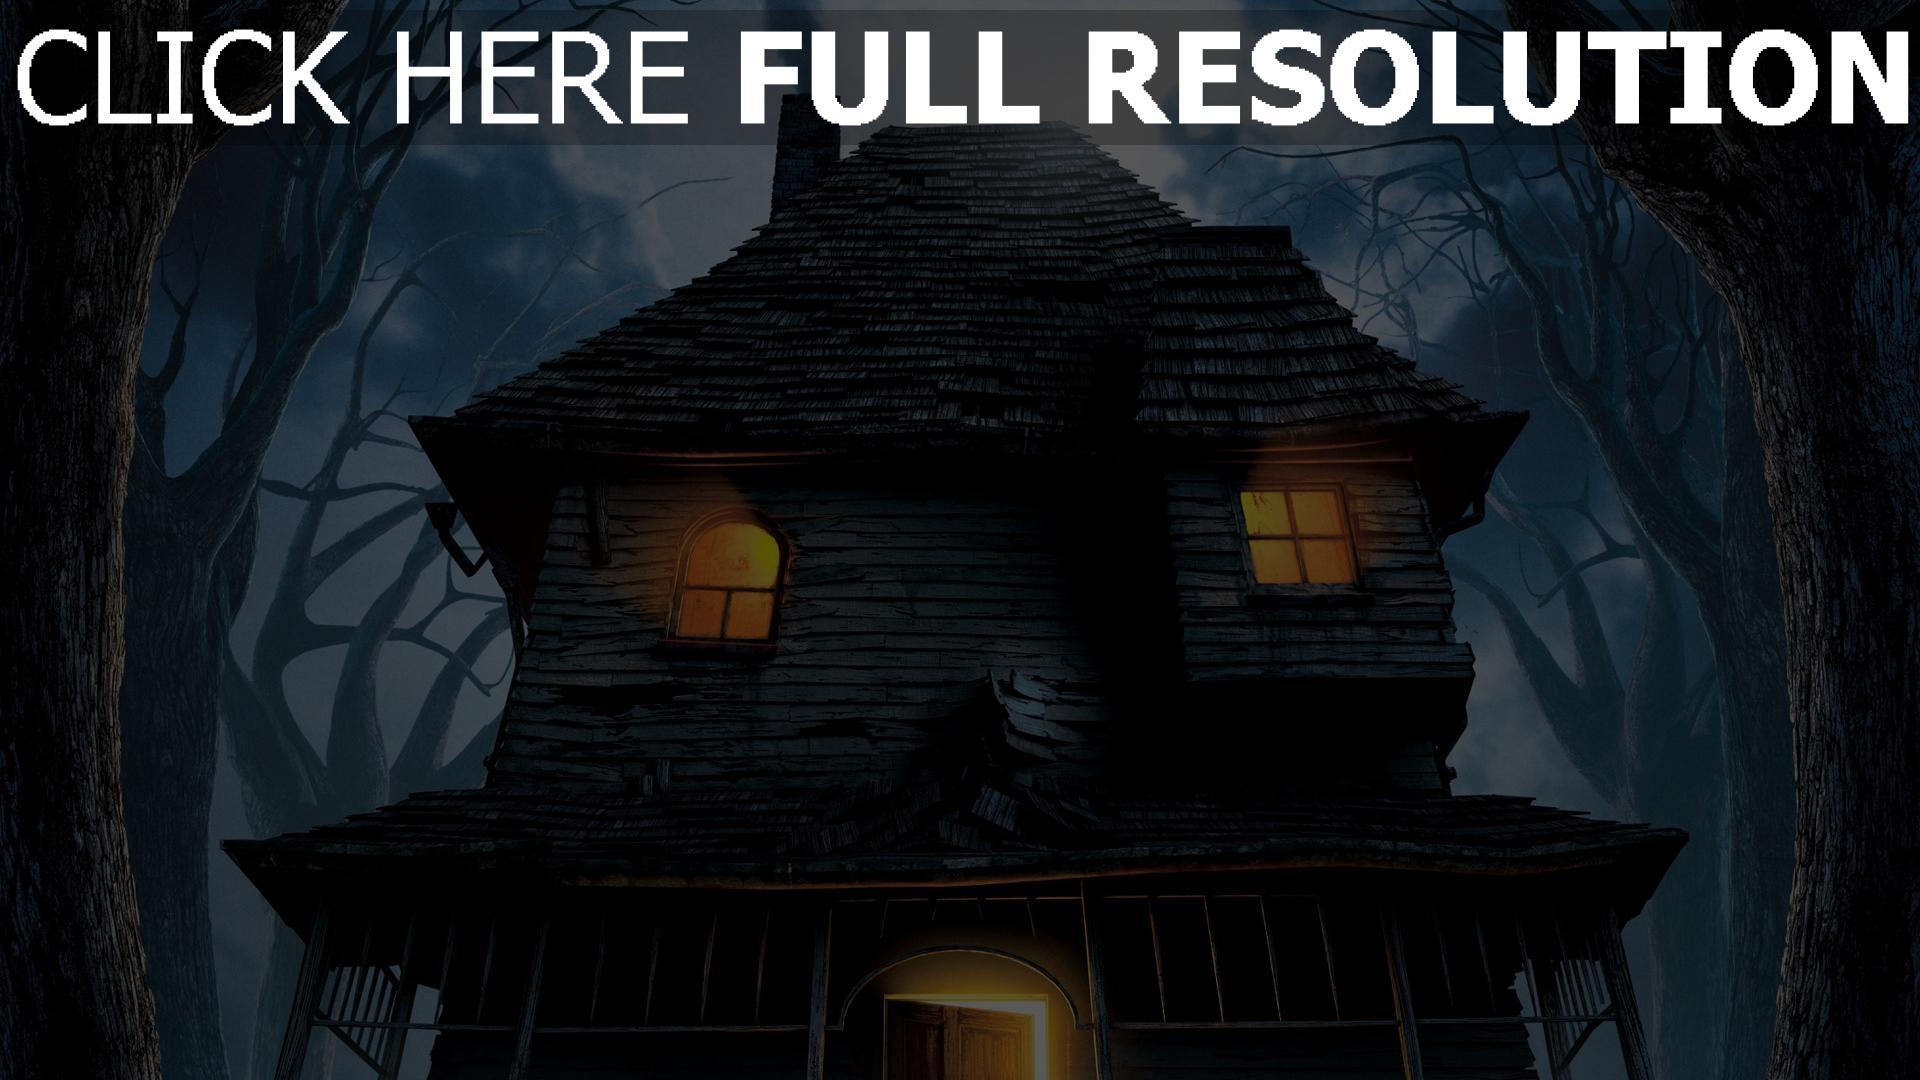 hd hintergrundbilder nacht bäume monster house haus risse 1920x1080